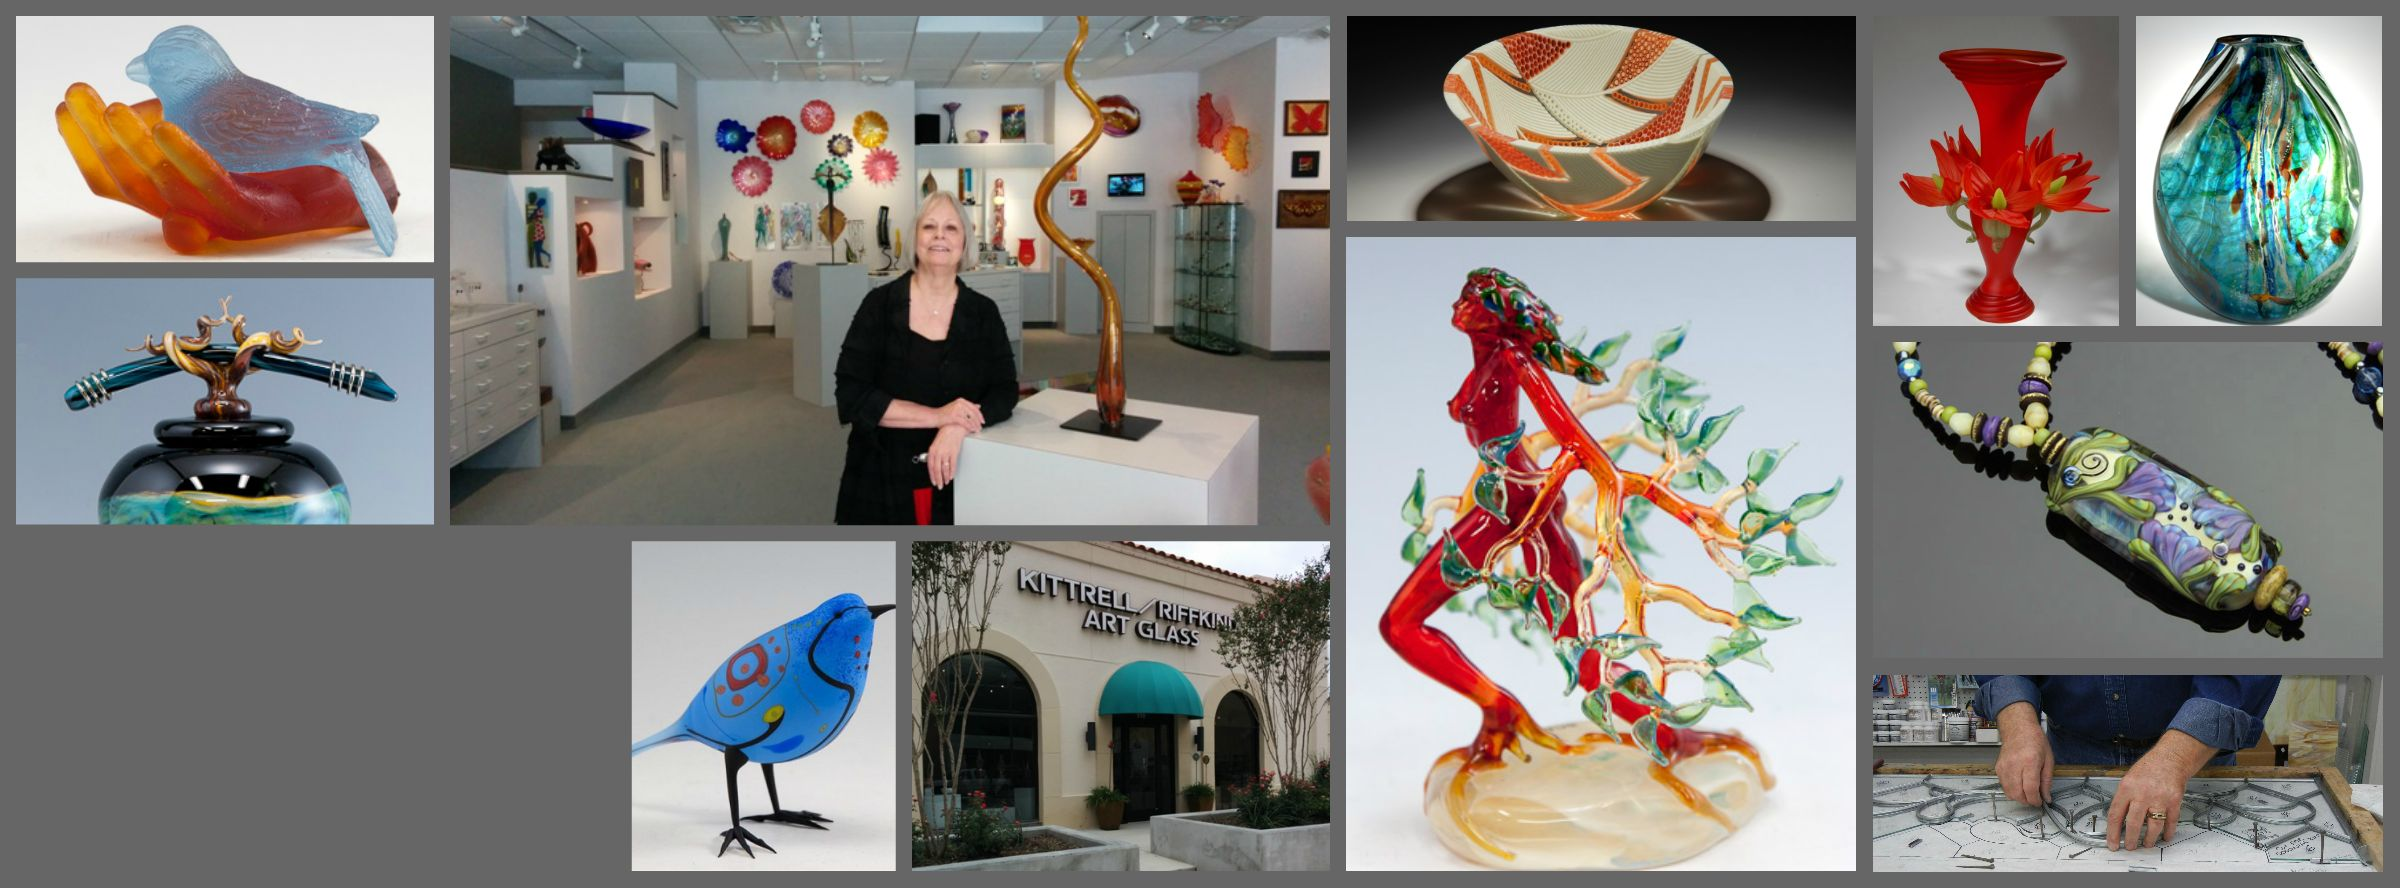 Kittrell Riffkind Art Glass Gallery